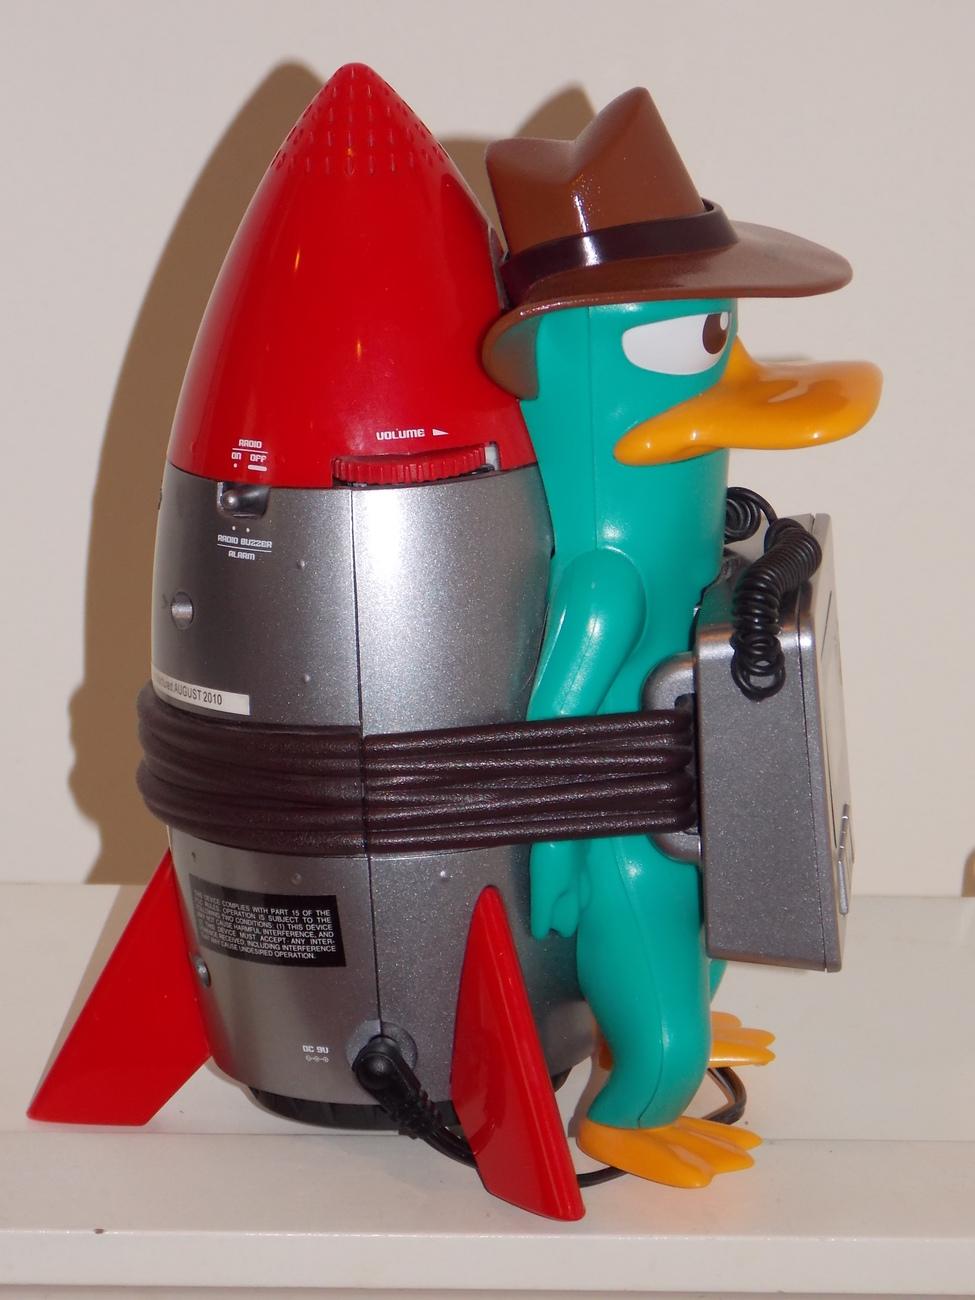 Disney Phineas and Ferb Alarm Clock Radio